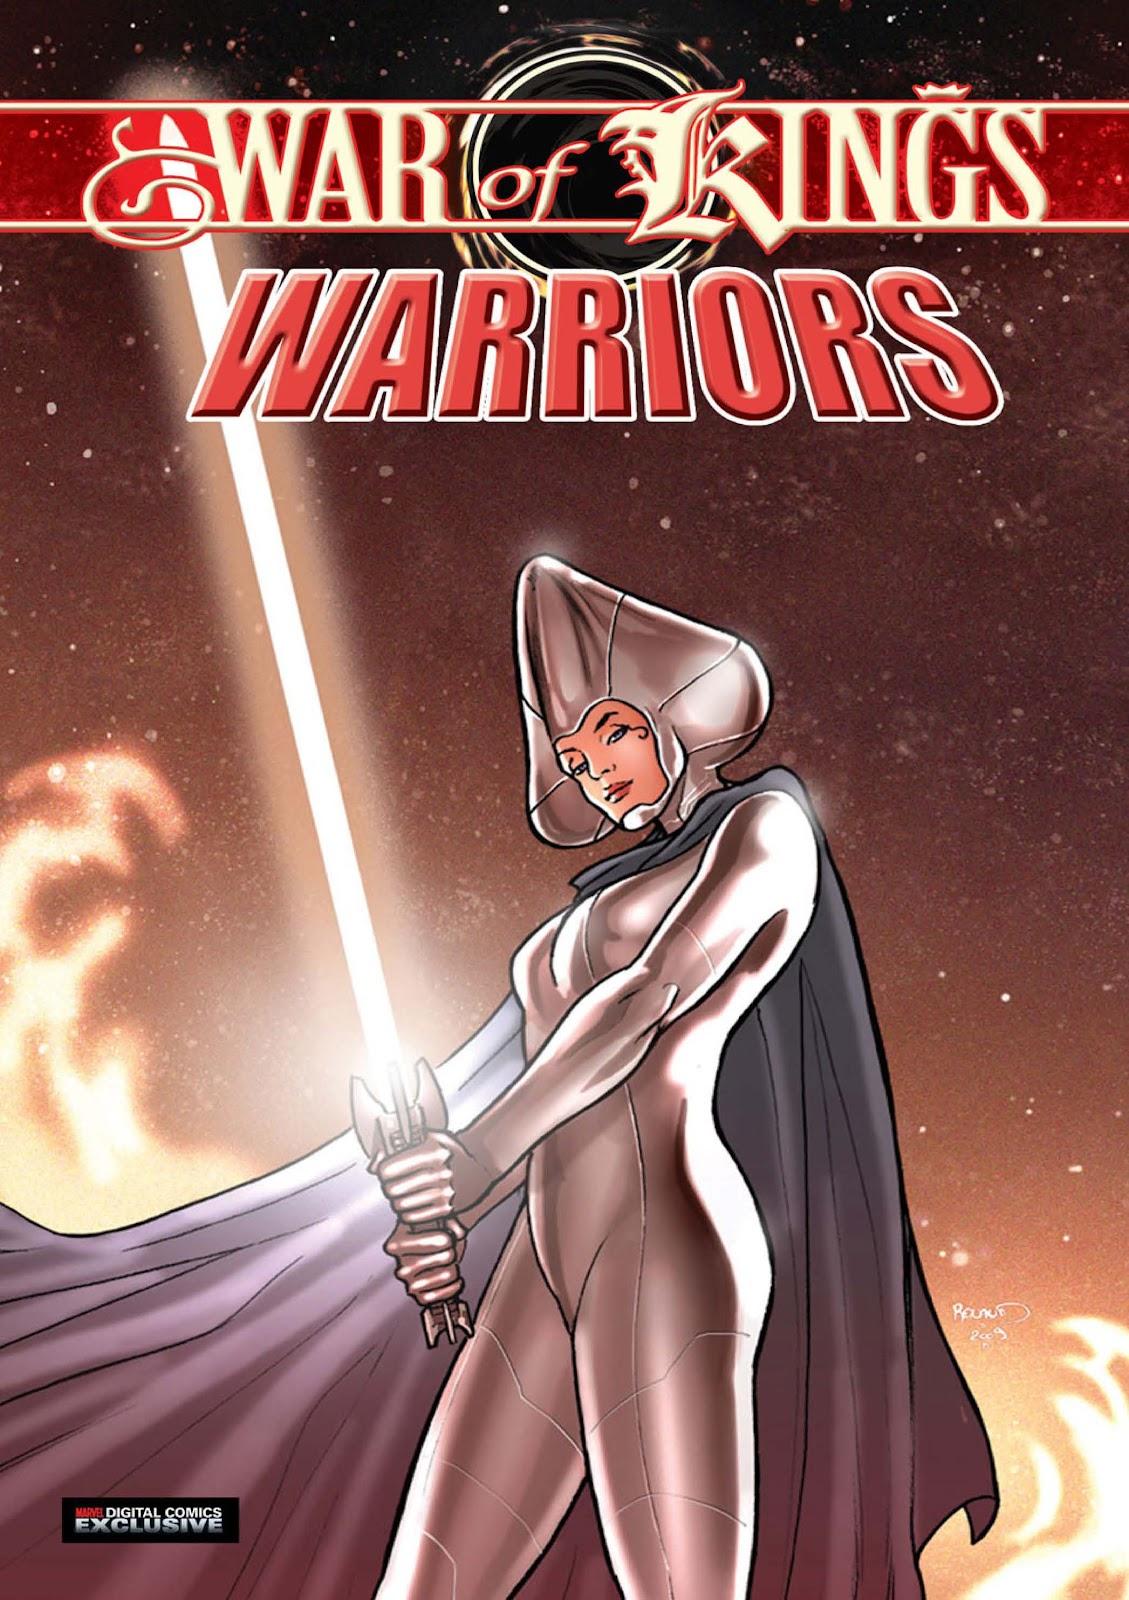 Read online War of Kings: Warriors - Lilandra comic -  Issue #1 - 1